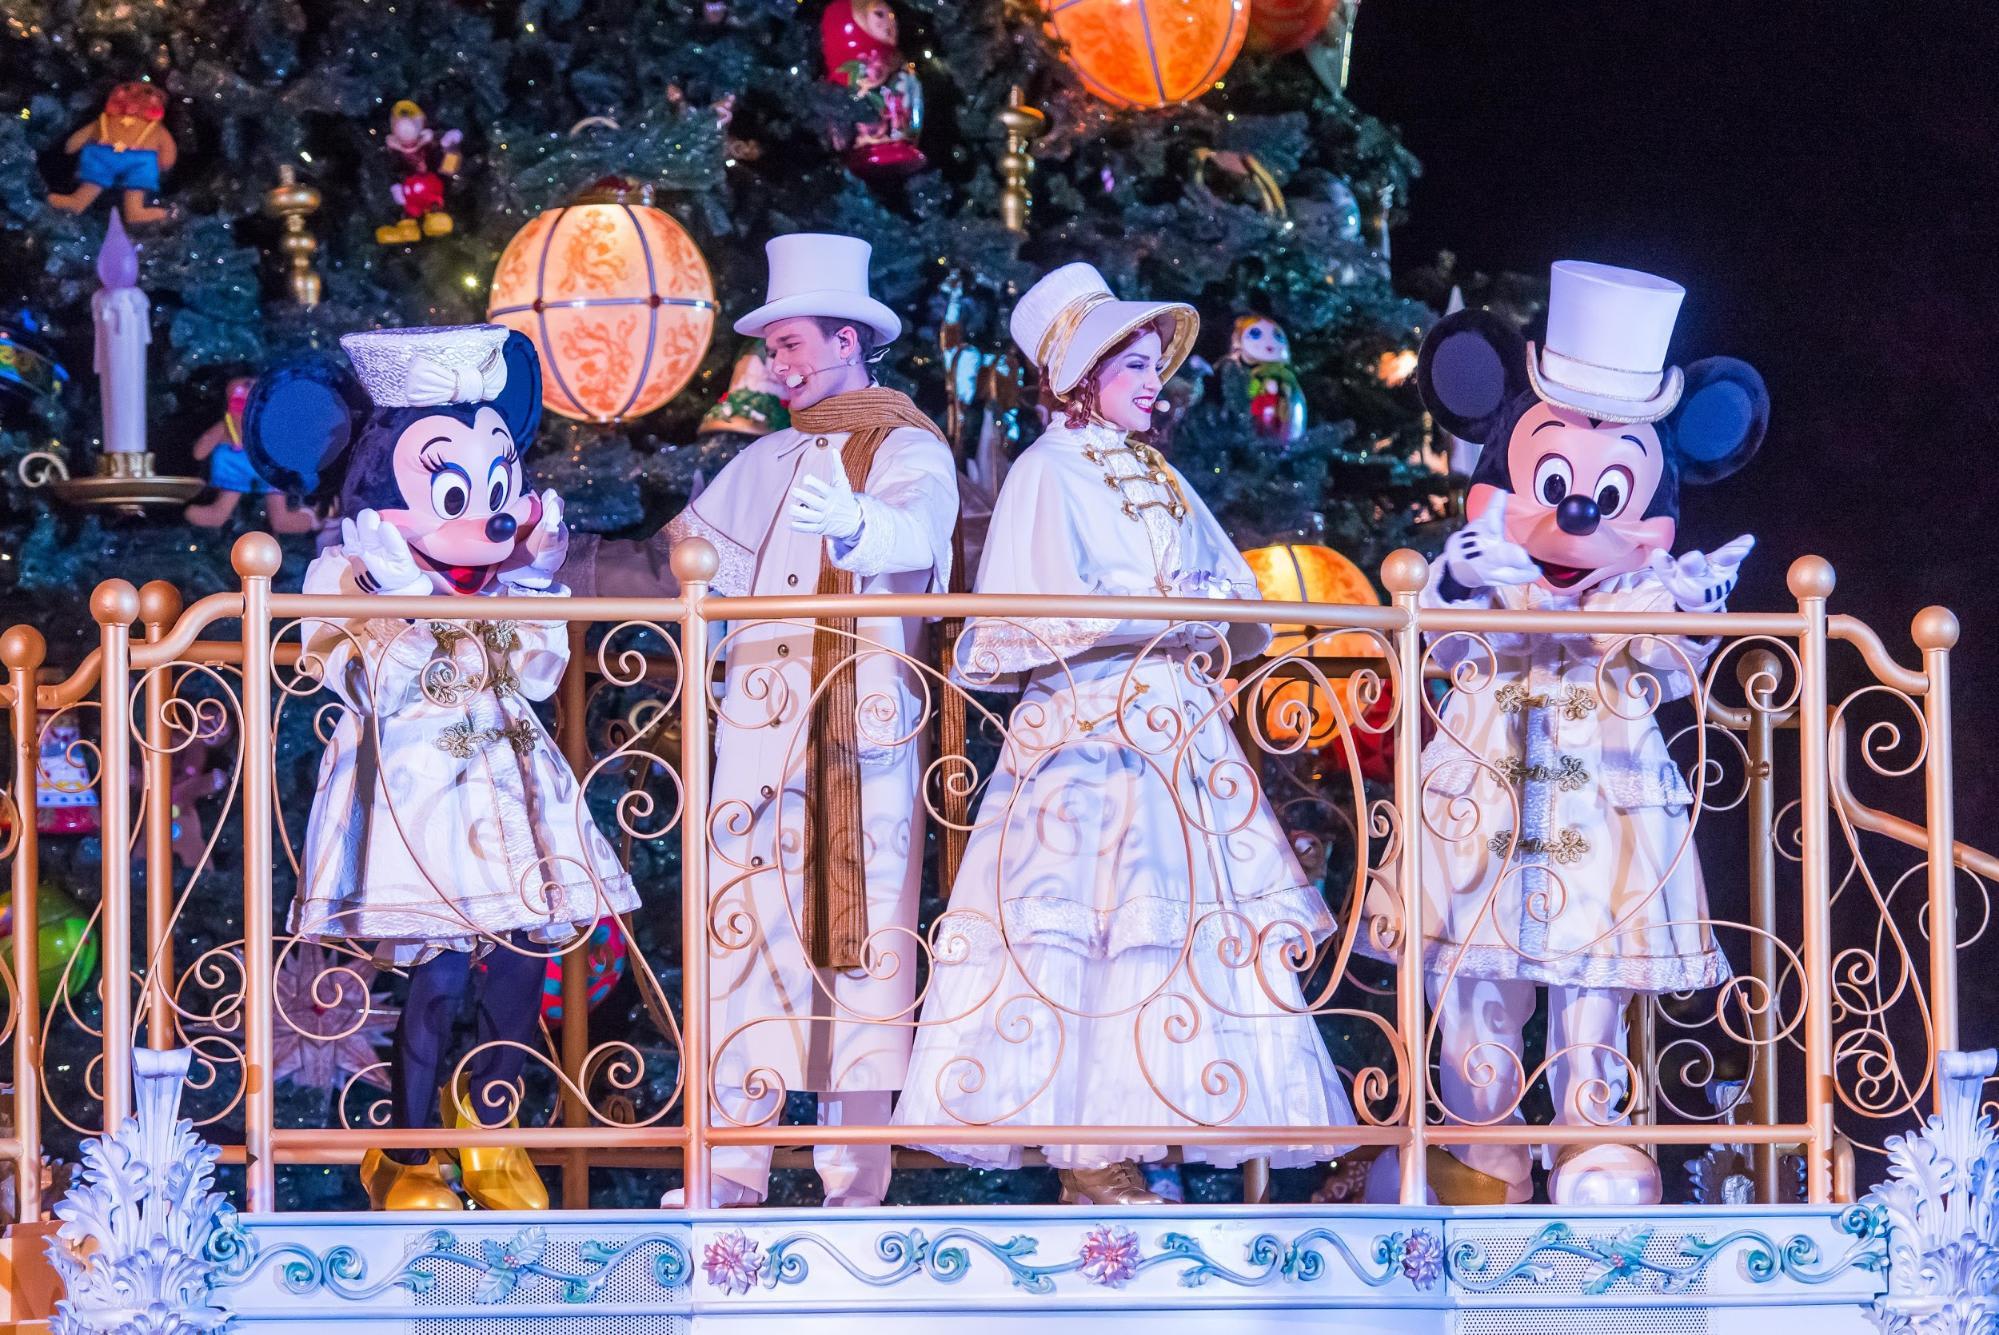 Night Parade at Paris Disneyland